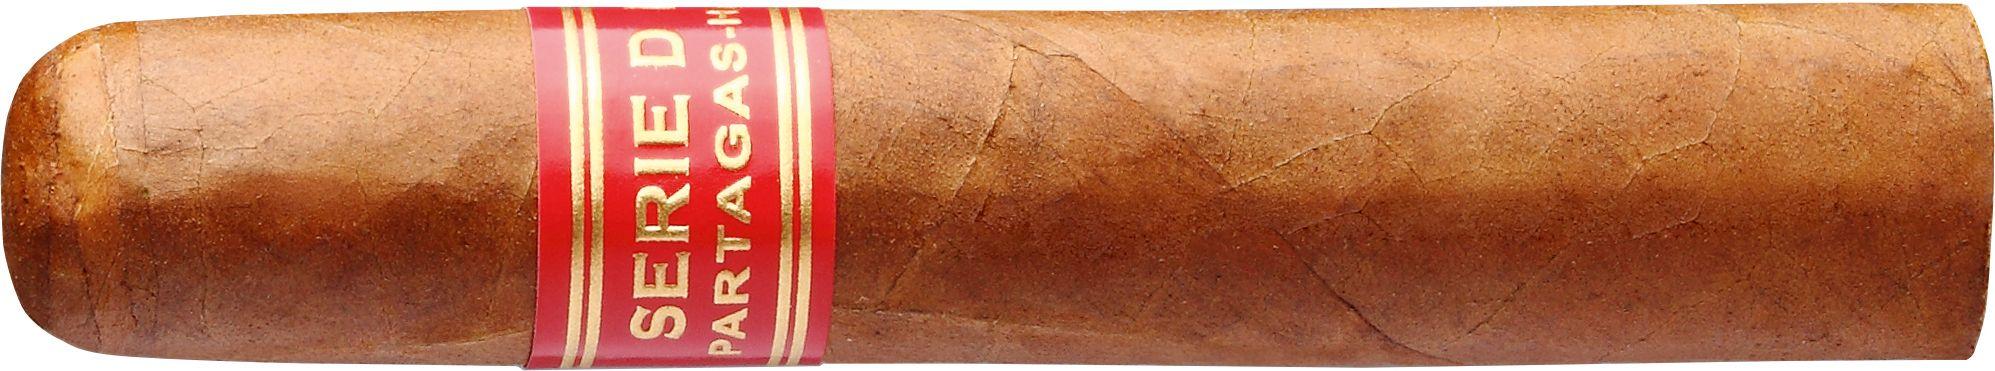 Partagas Serie D  No. 5 bei Cigarworld.de dem Online-Shop mit Europas größter Auswahl an Zigarren kaufen. 3% Kistenrabatt, viele Zahlungsmöglichkeiten, Expressversand, Personal Humidor uvm.